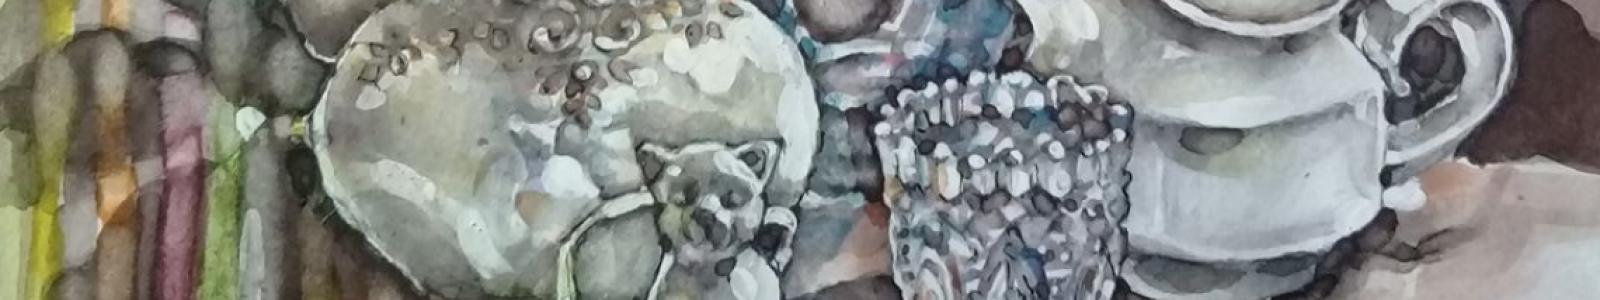 Gallery Painter julia Chaduneli